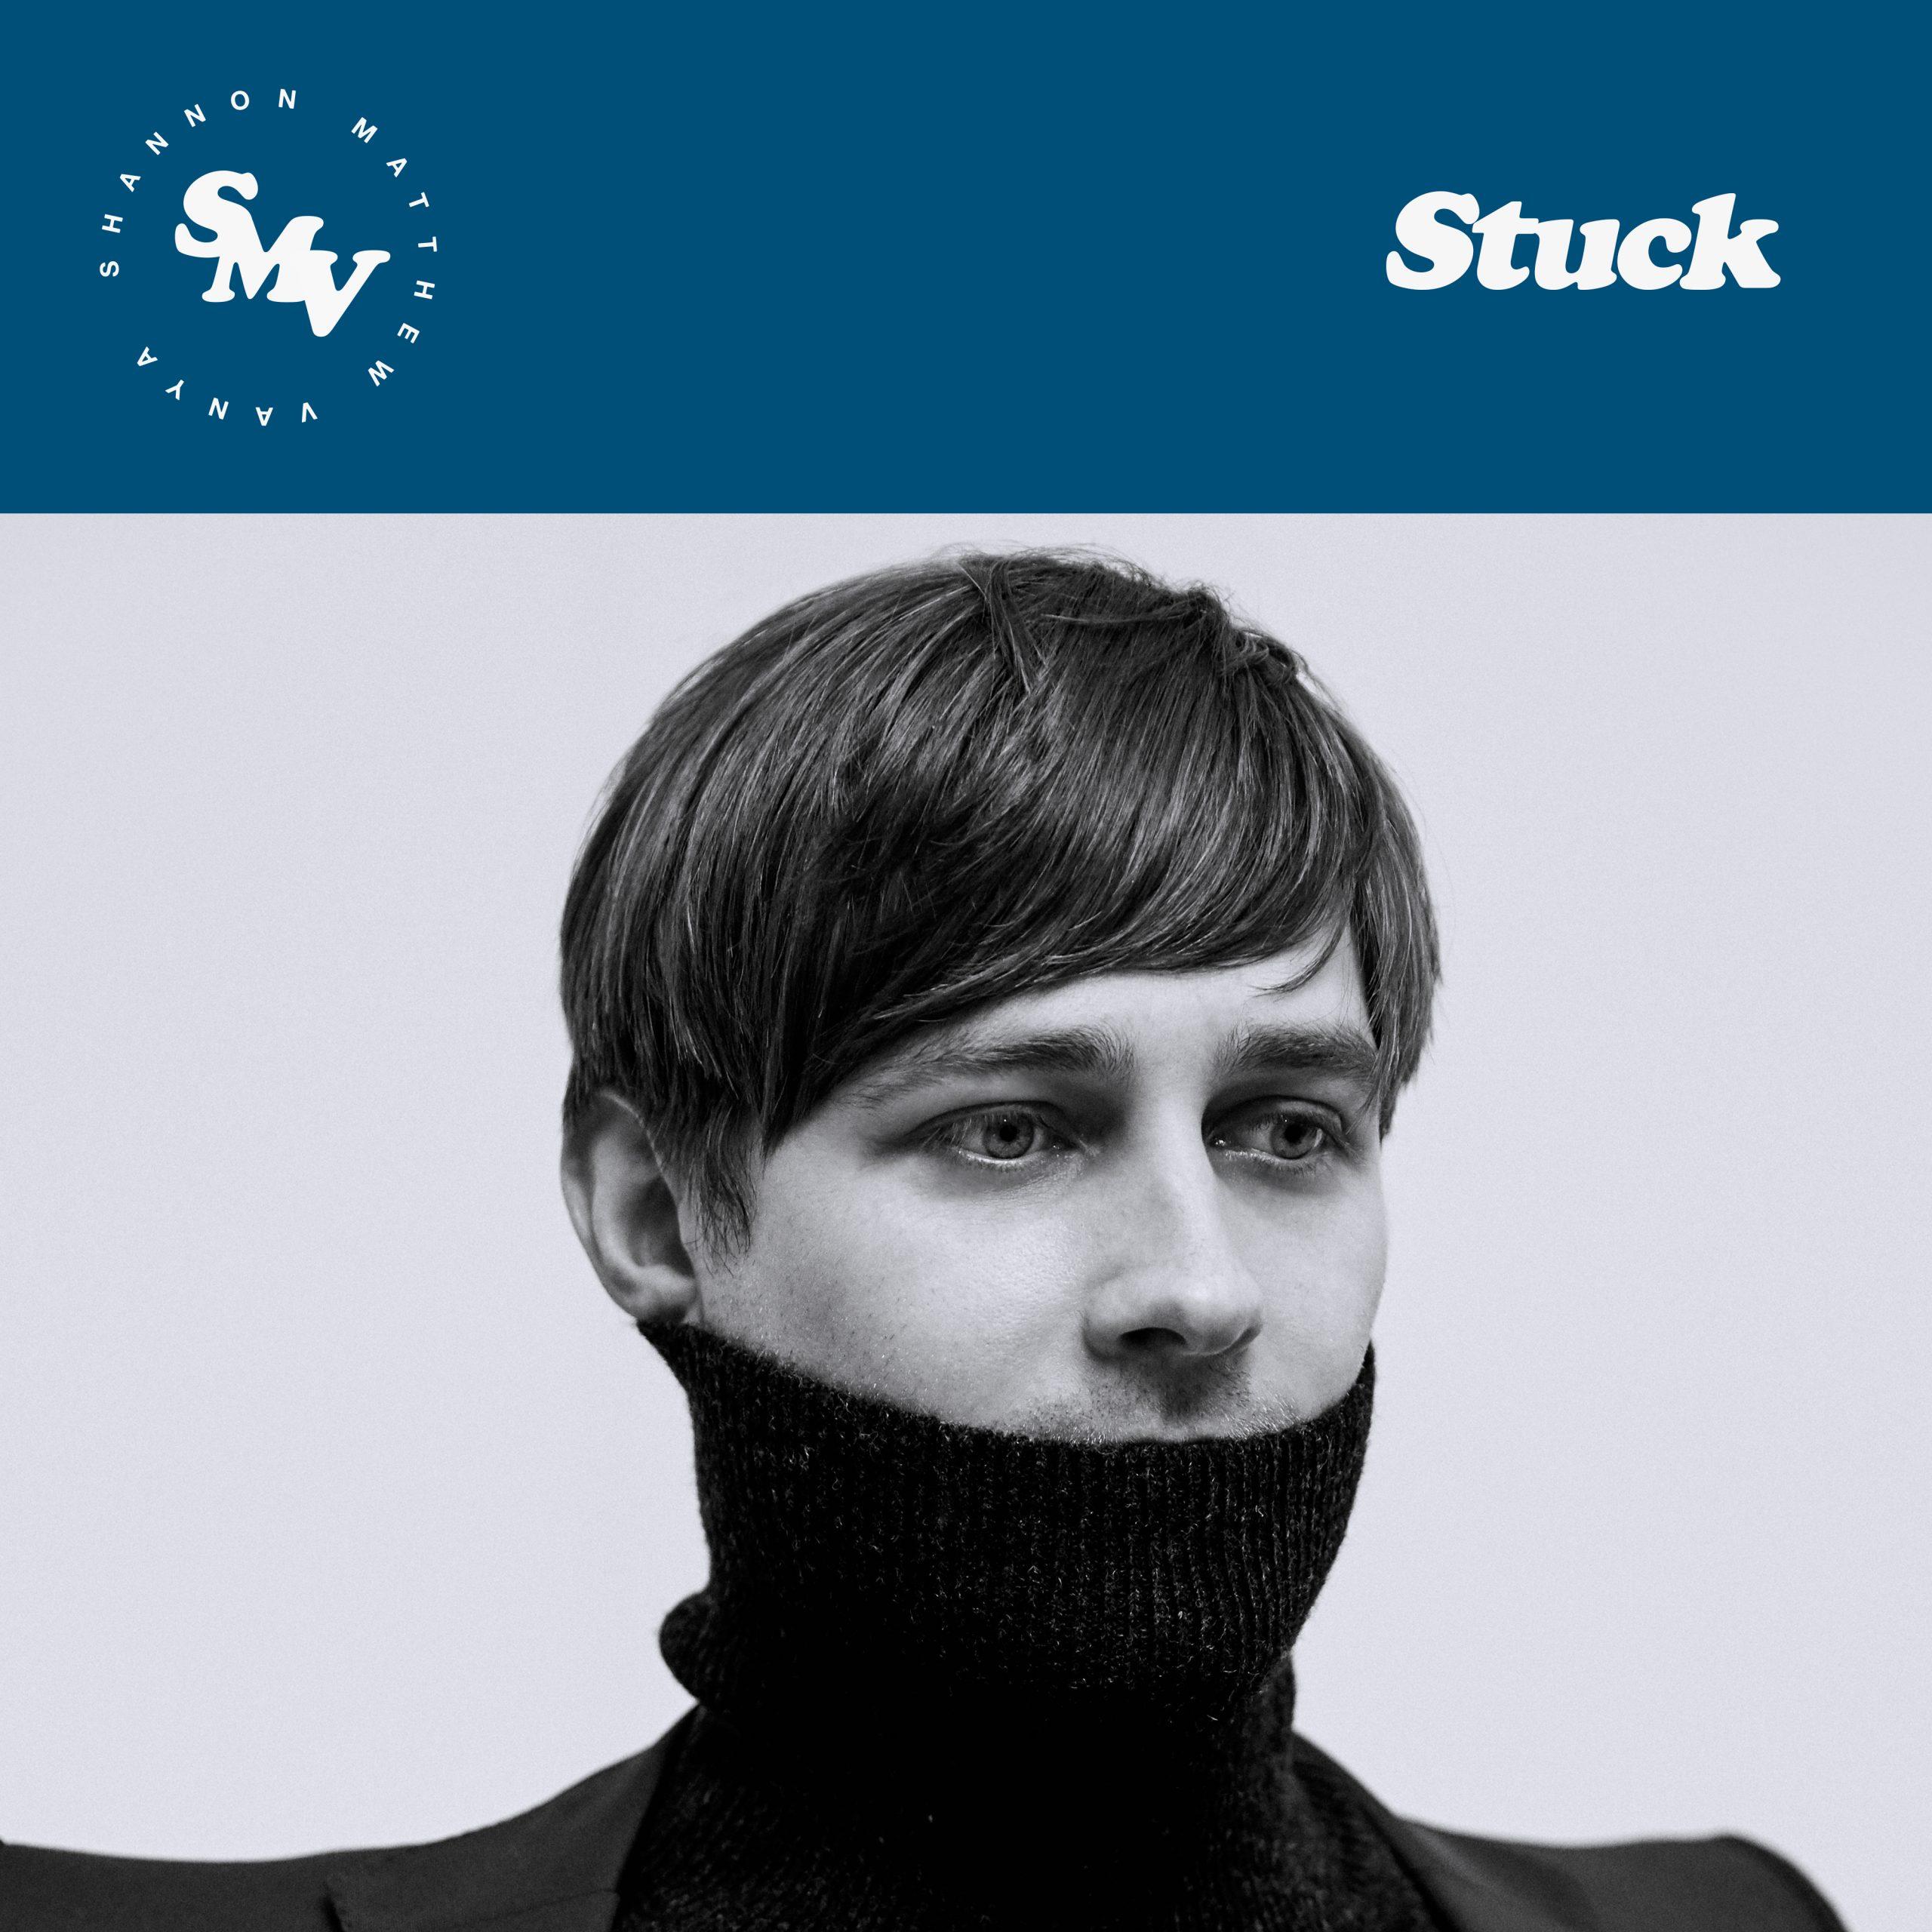 Shannon Matthew Vanya – Stuck